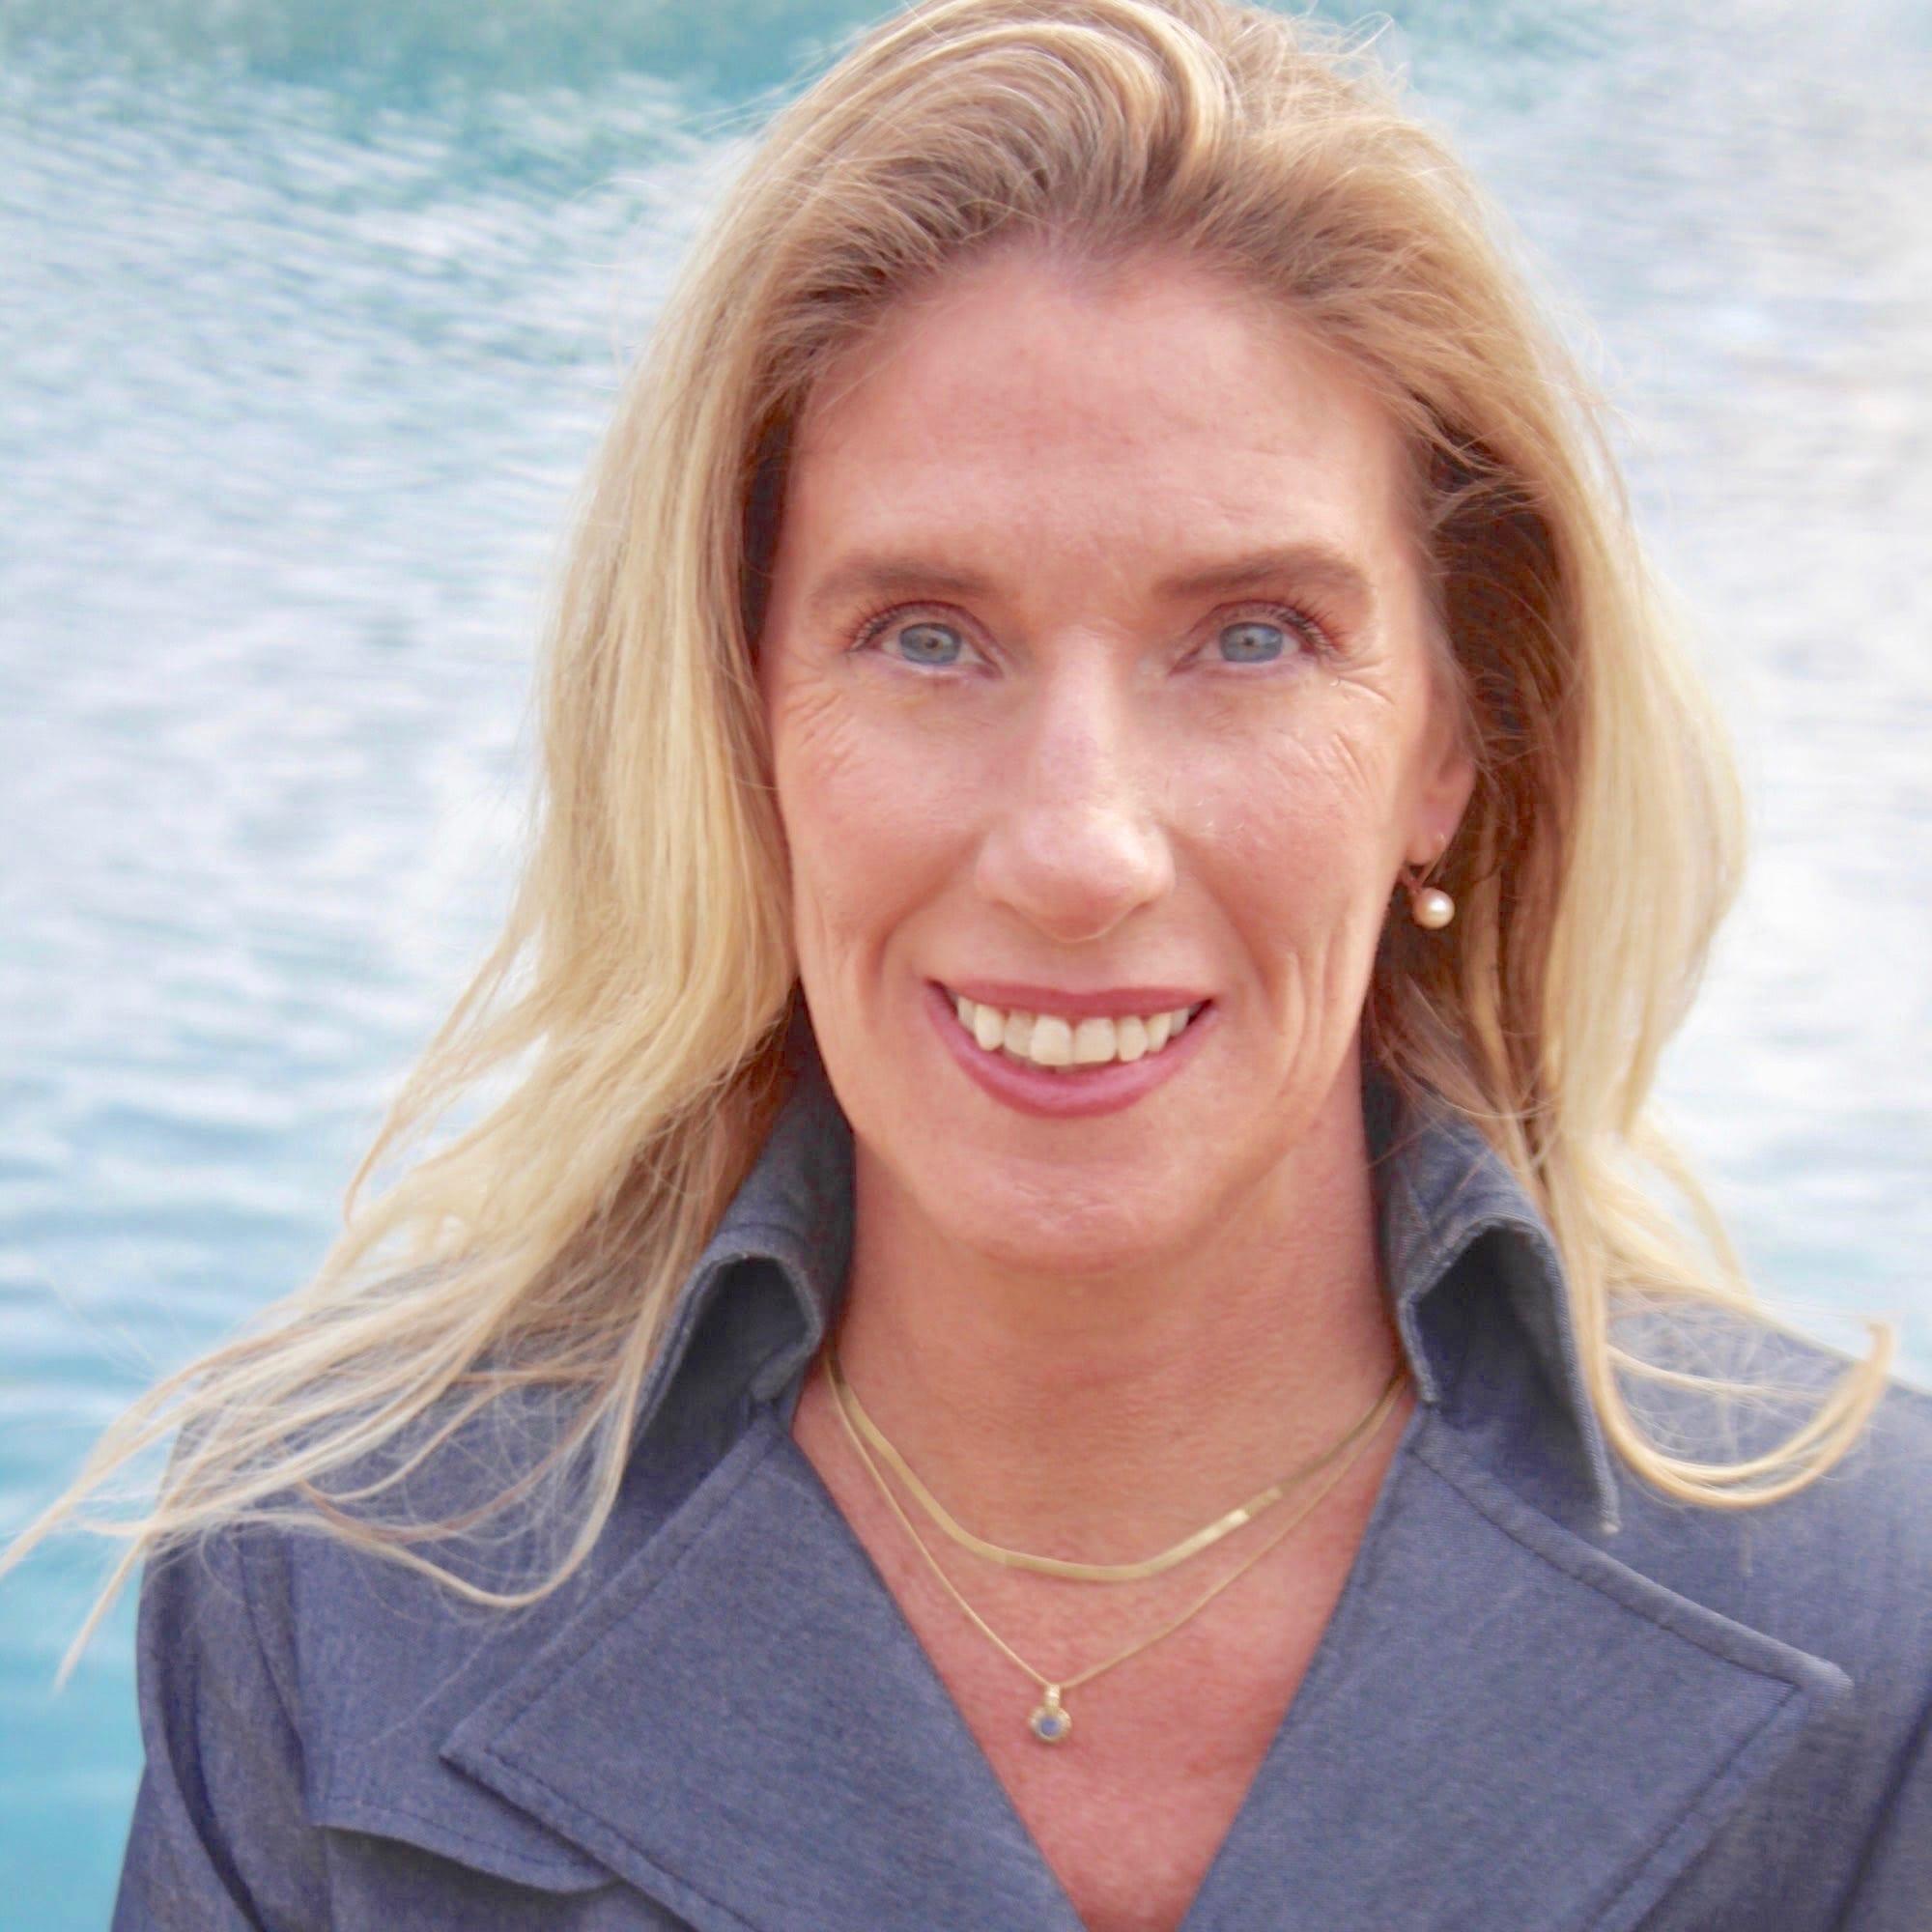 Dr Bella Icenhower, Naturopathic Functional Medicine Doctor in Tyler Texas